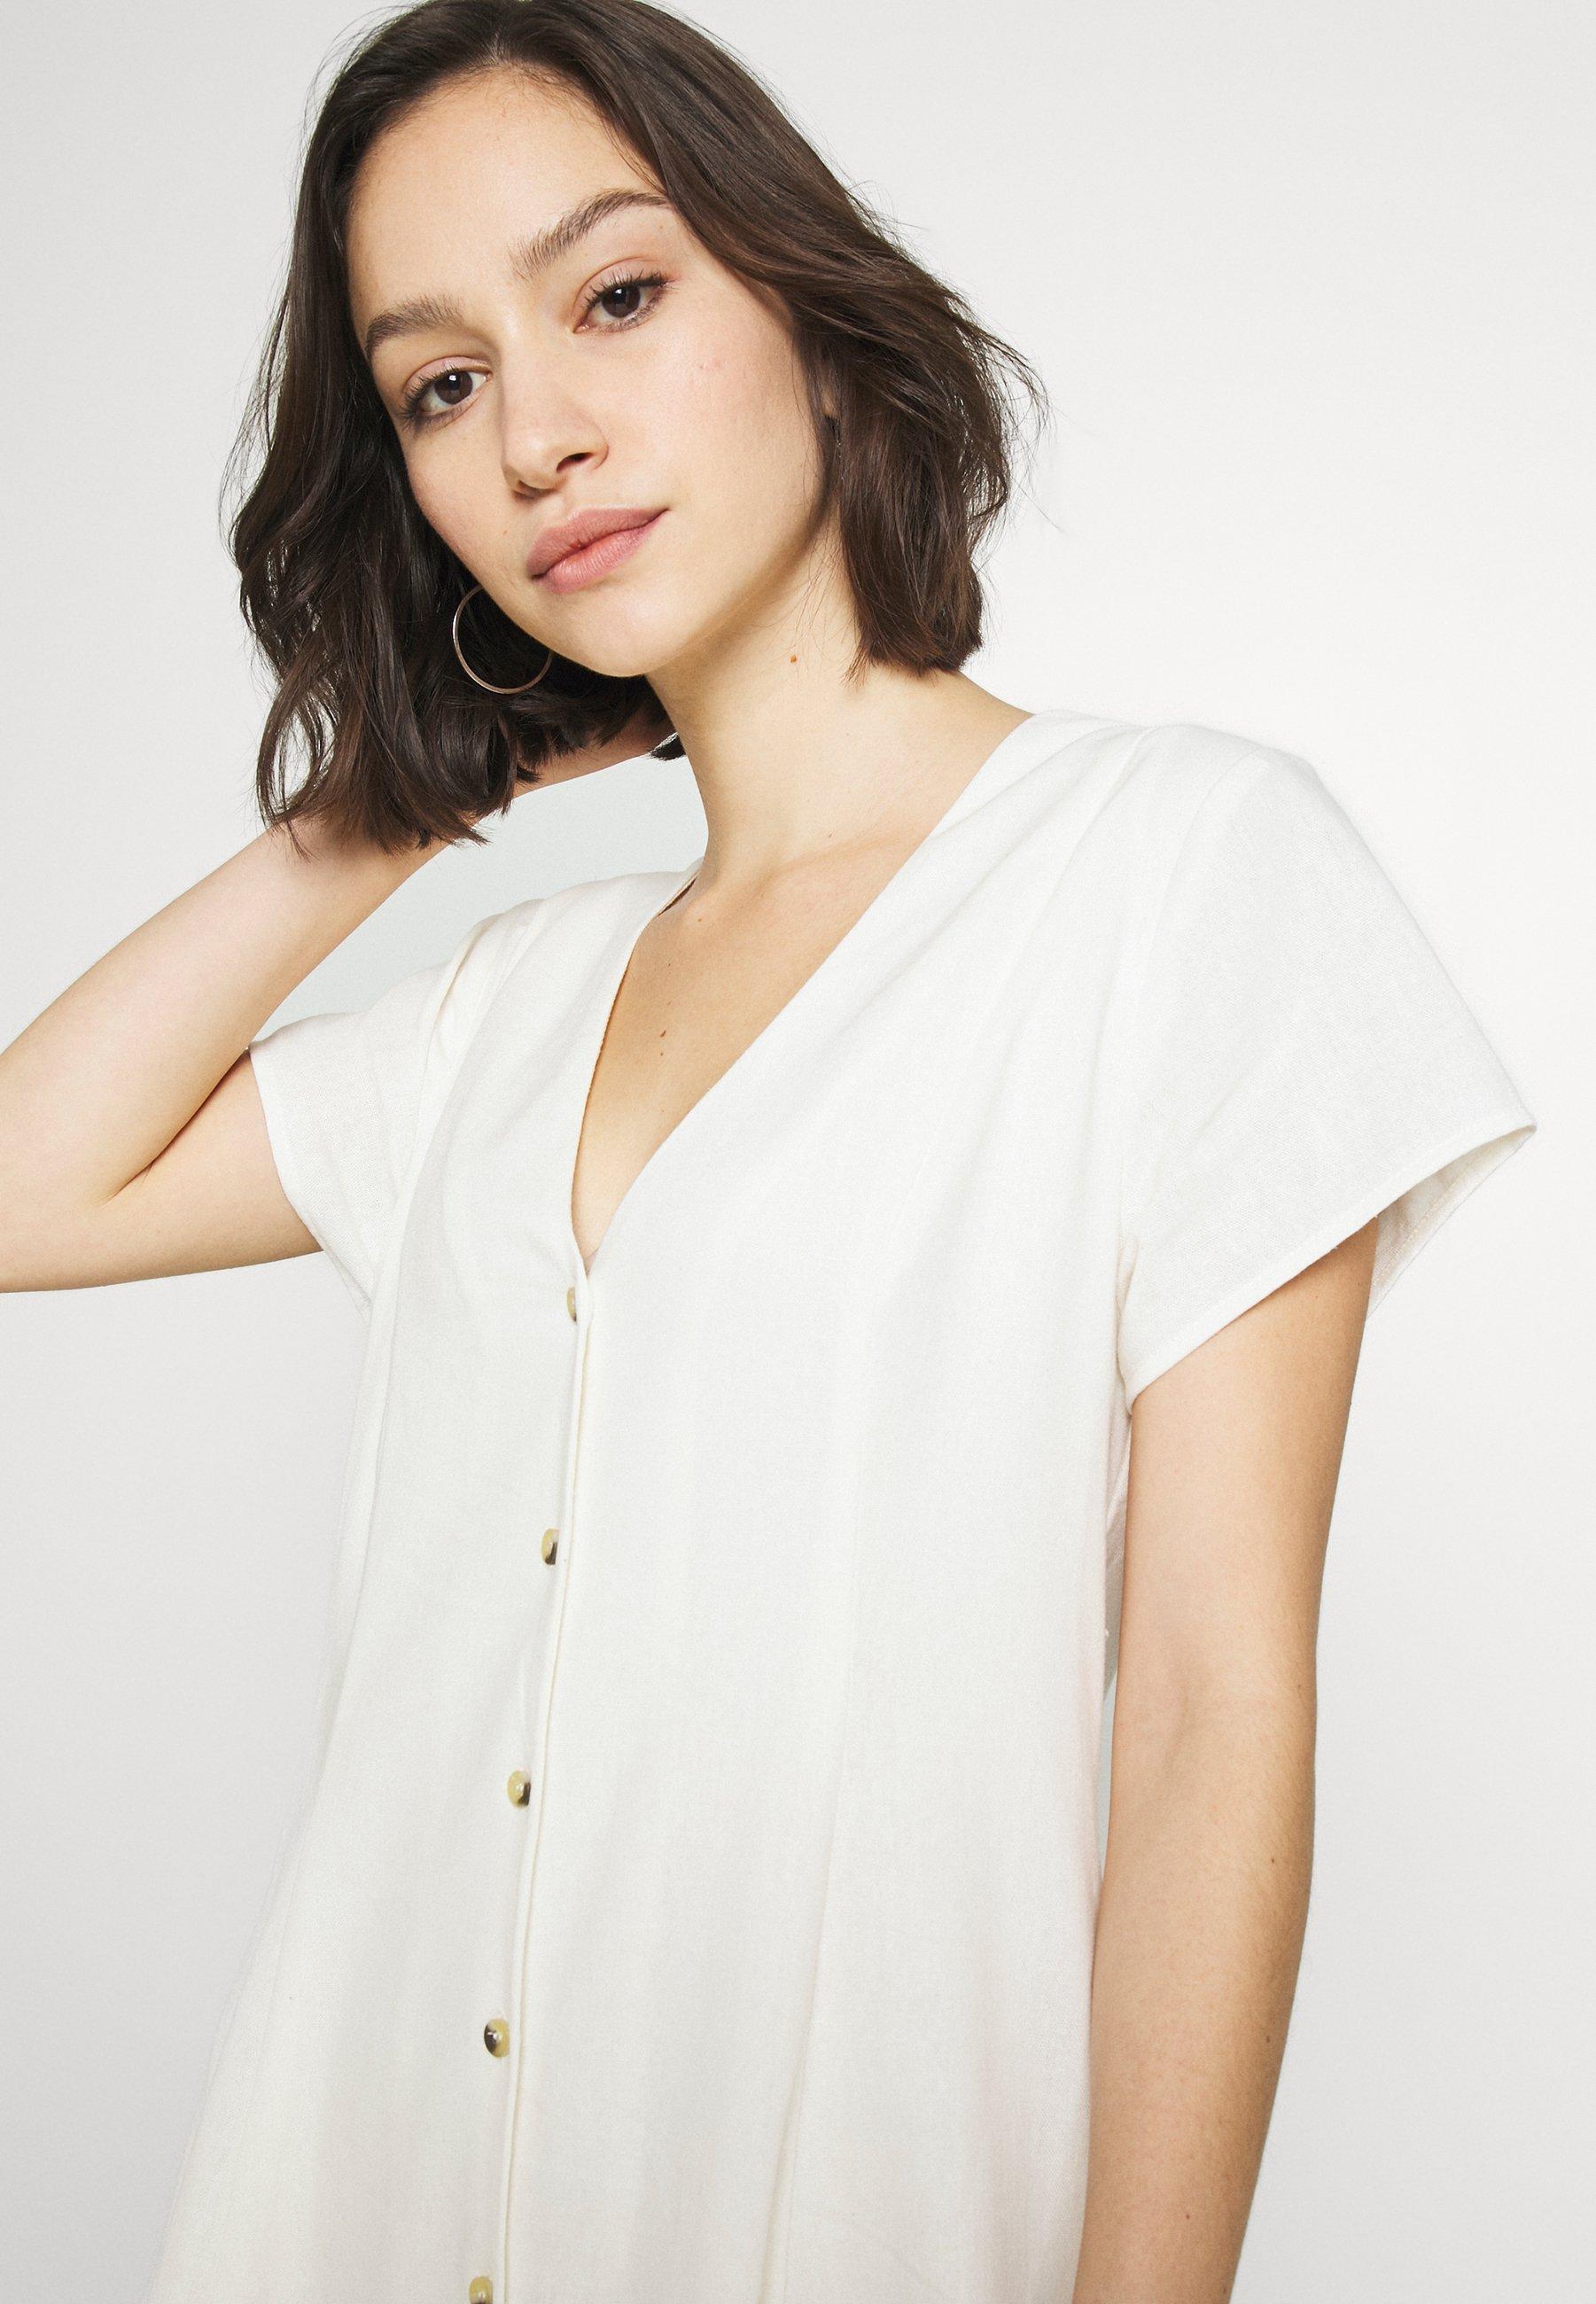 Rolla\'s Milla Dress - Blousejurk Vintage White